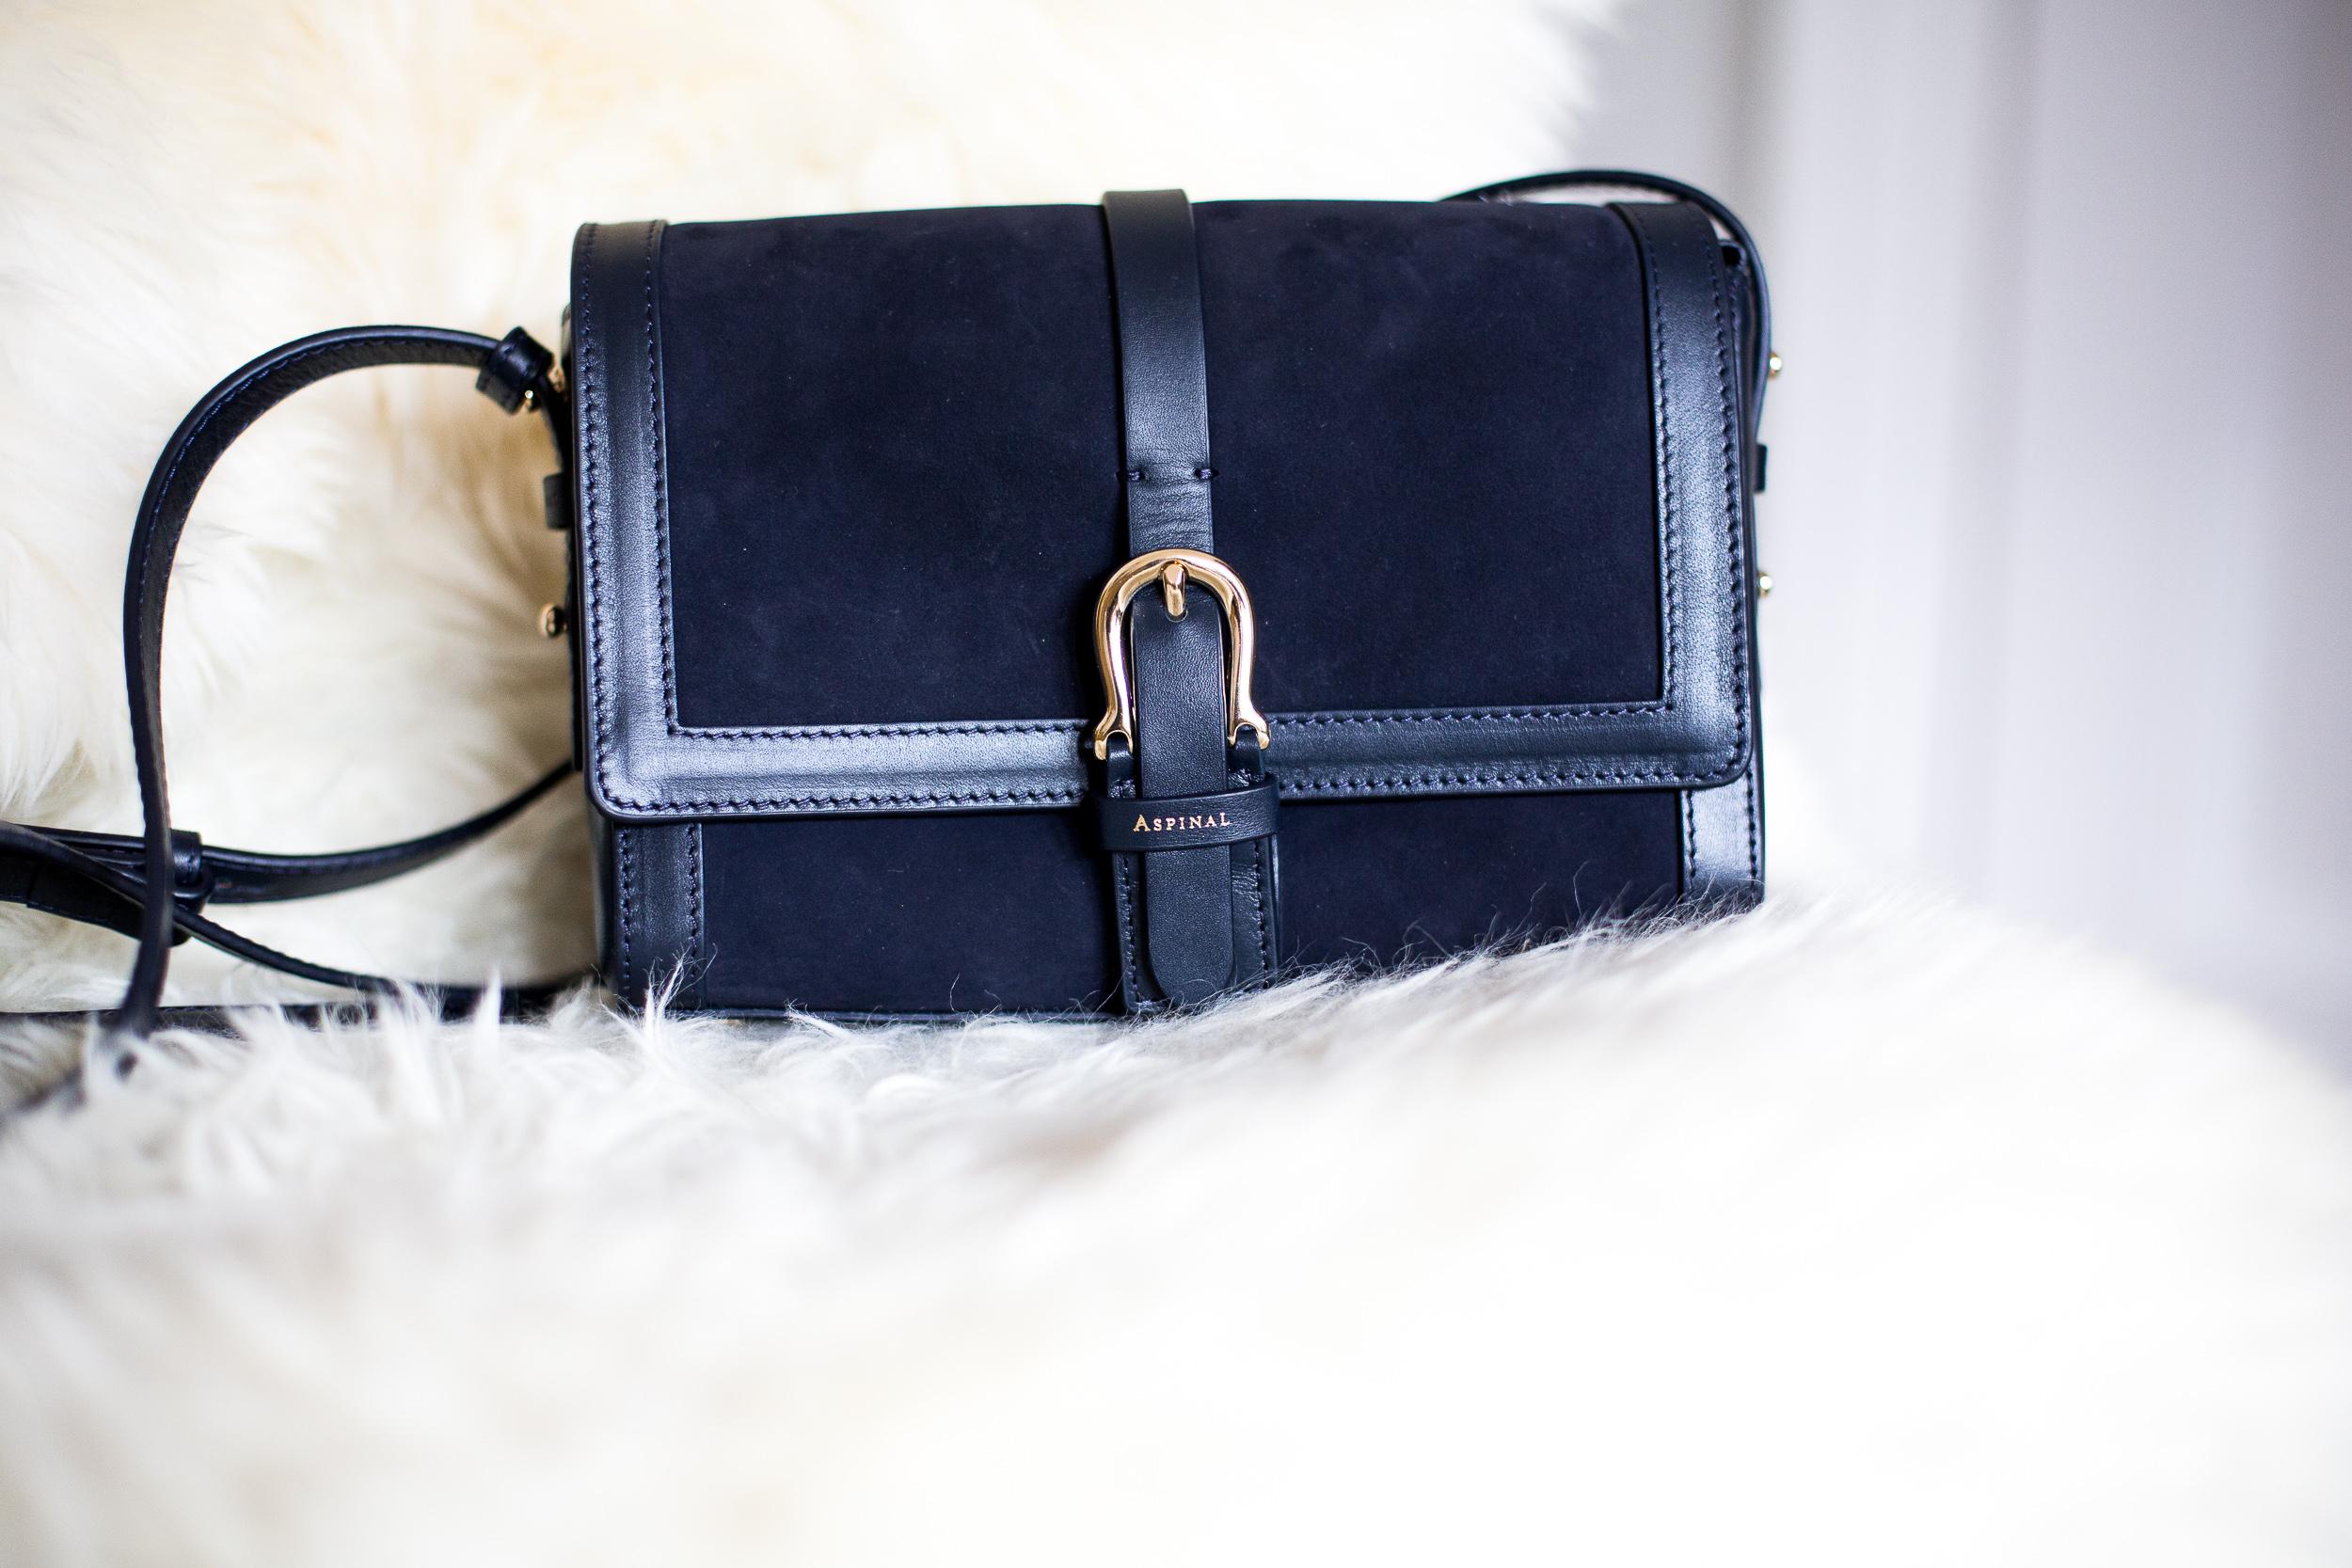 Aspinal Buckle Bag